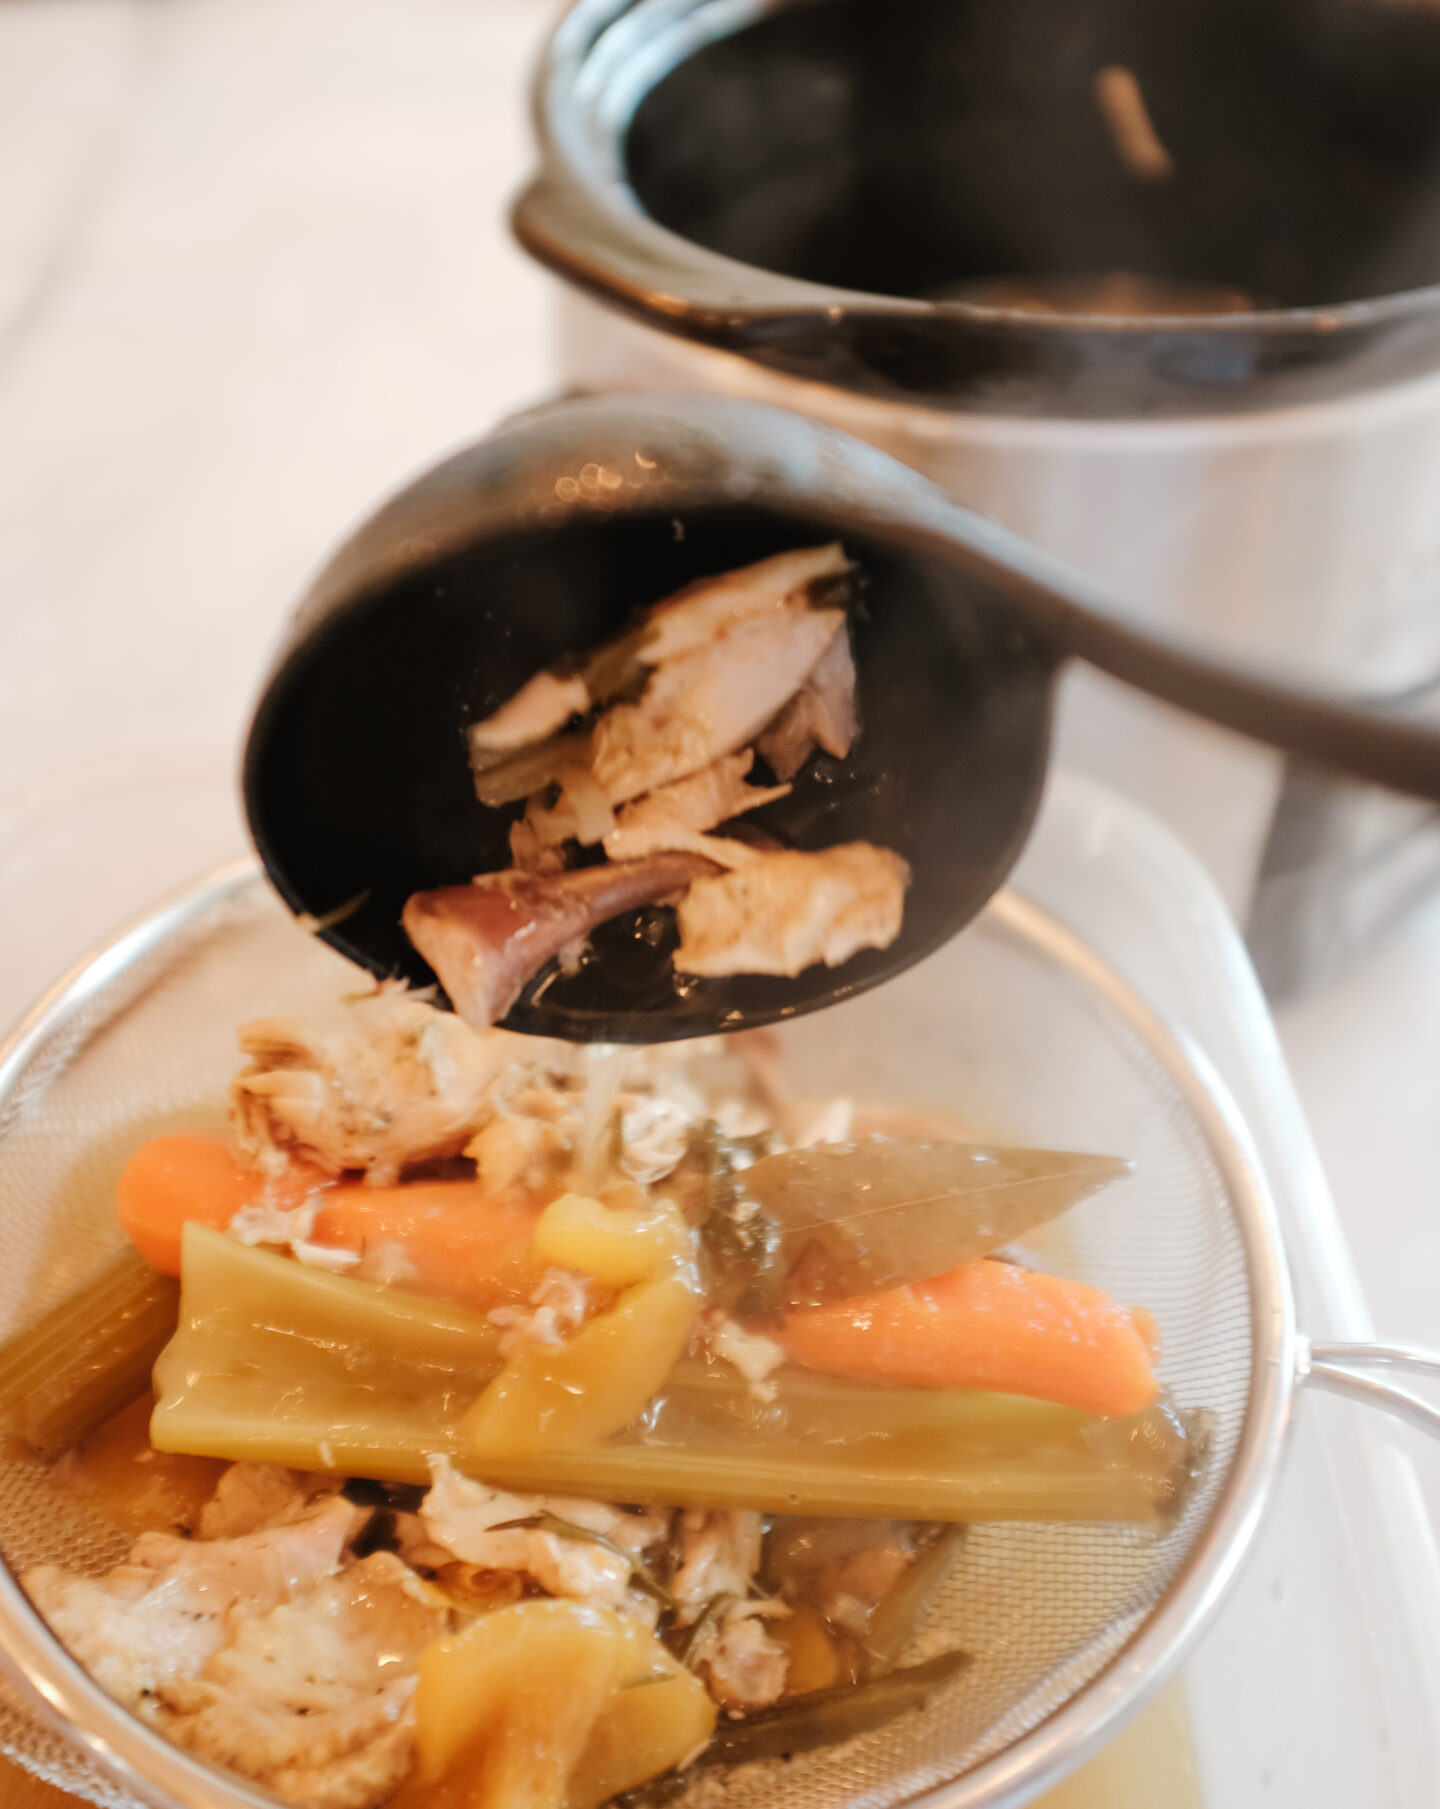 Chicken bone broth recipe with a crockpot